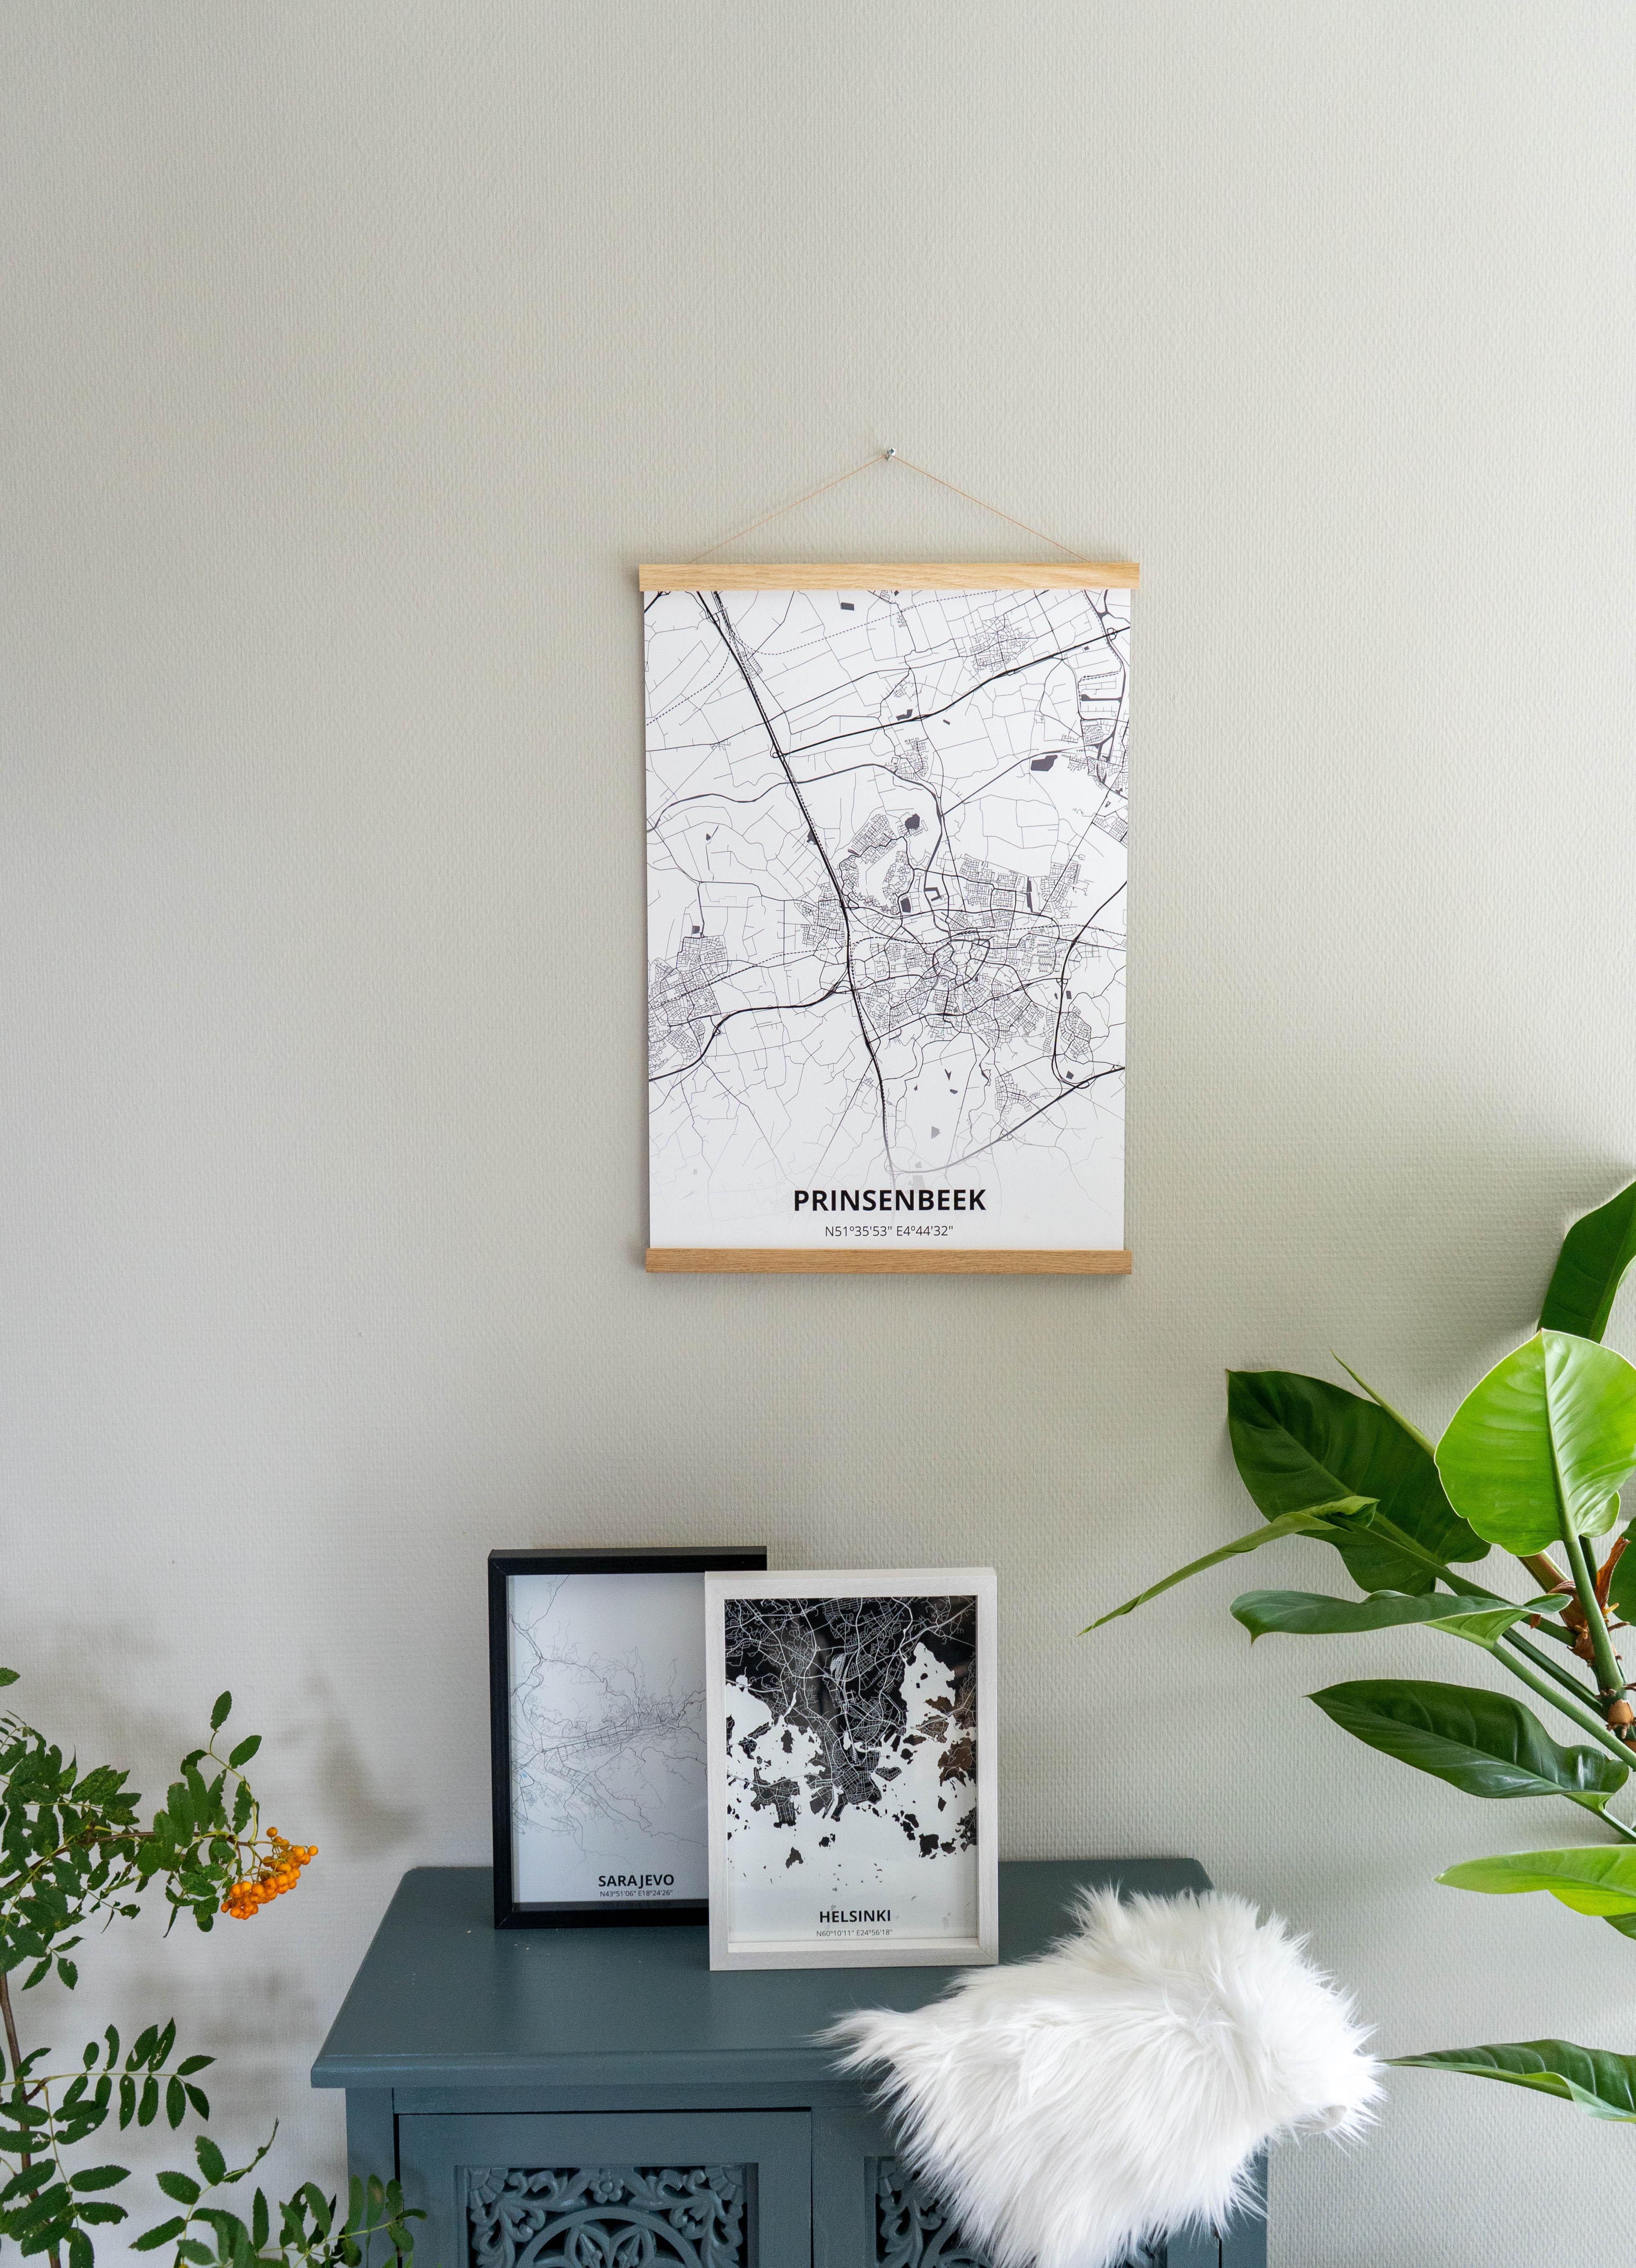 DIY frame